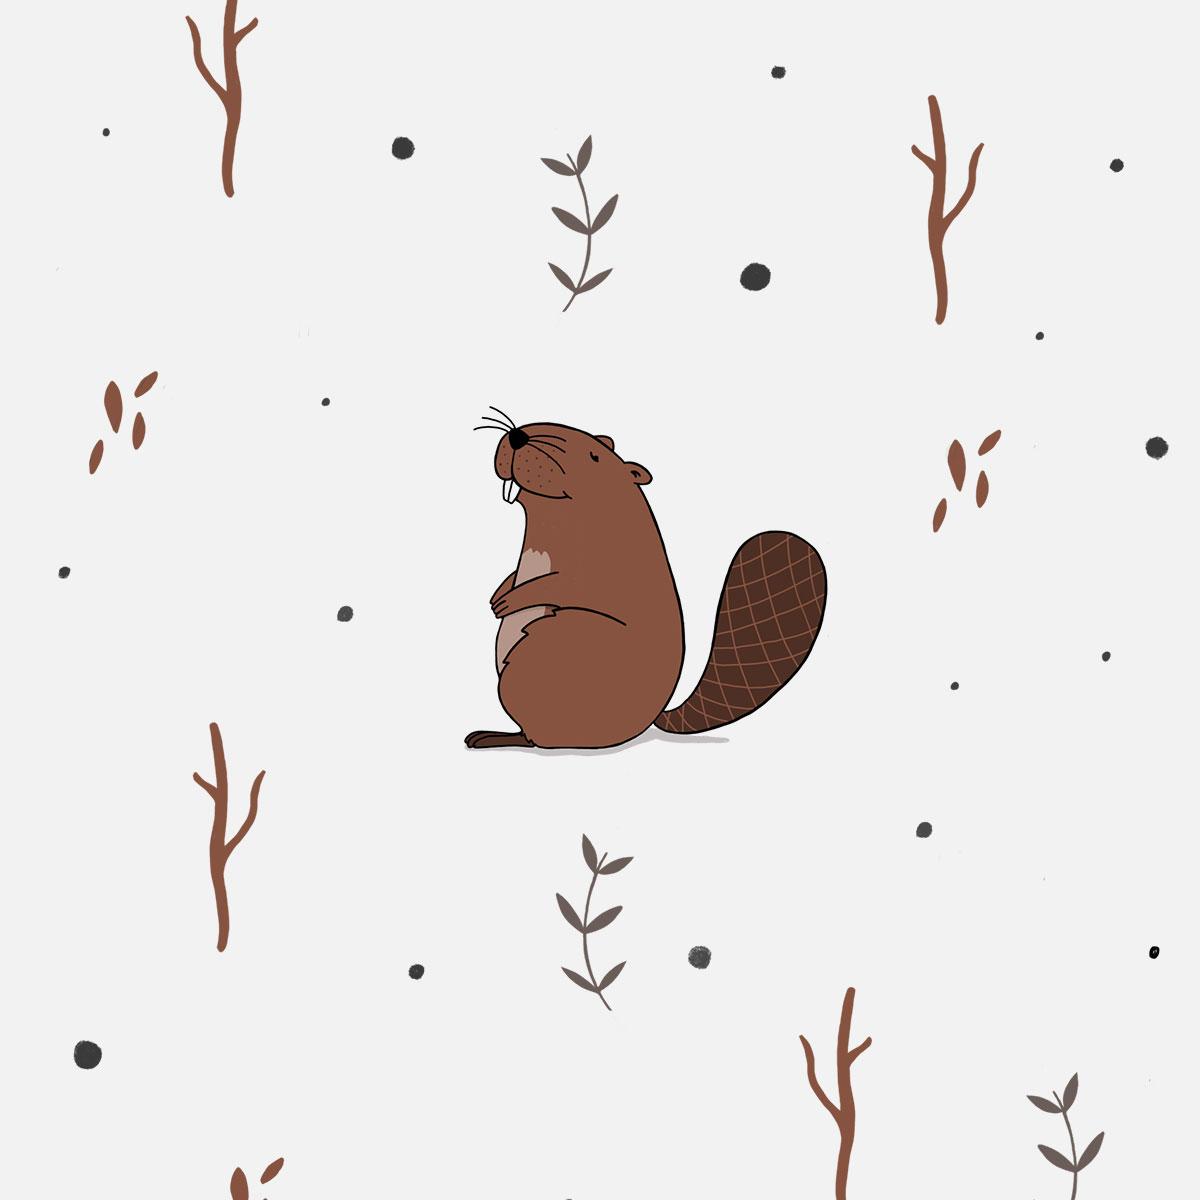 Illustration Waldtiere - Biber